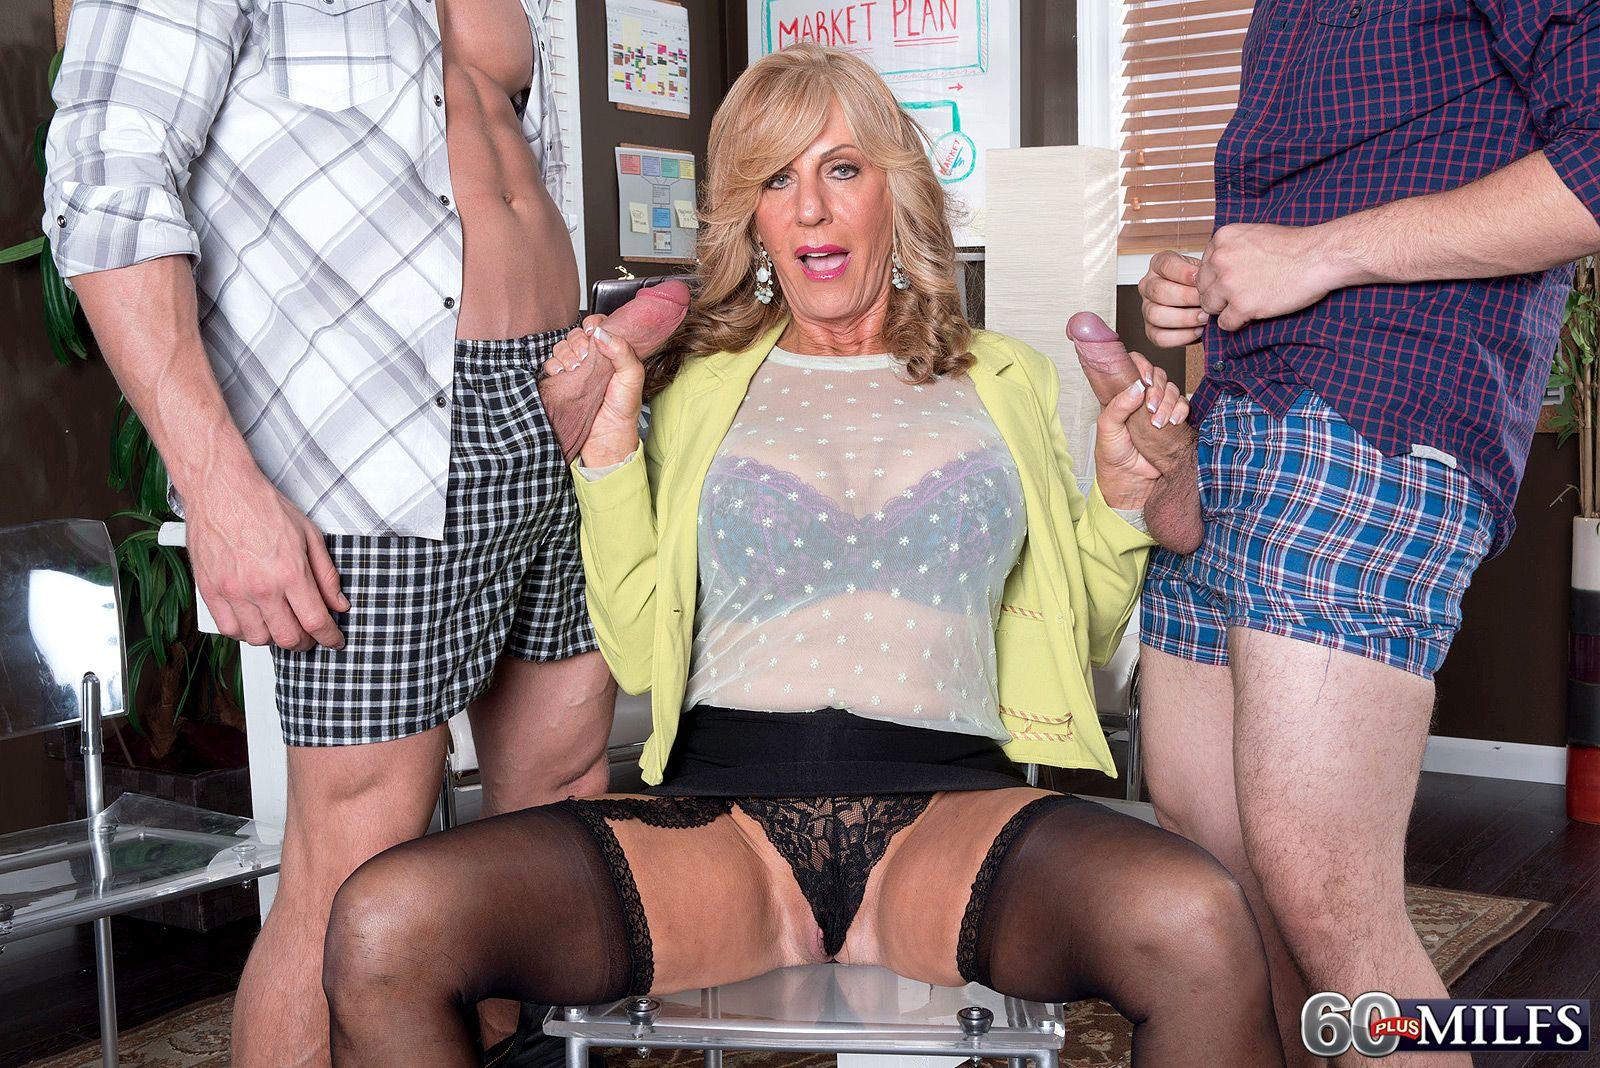 Leggy blonde granny in black stockings jerking off 2 big dicks at the same time